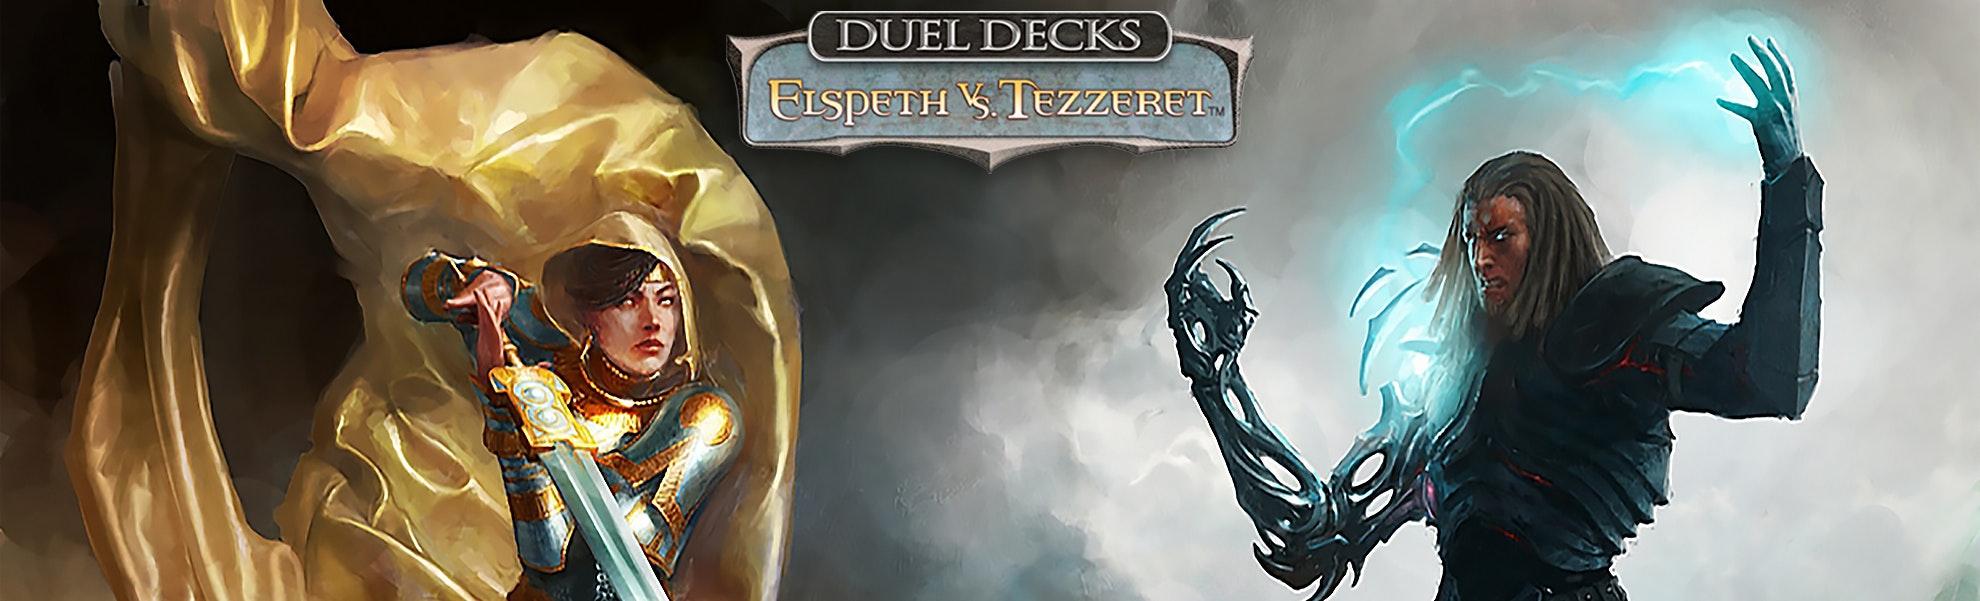 Elspeth Vs. Tezzeret Duel Decks